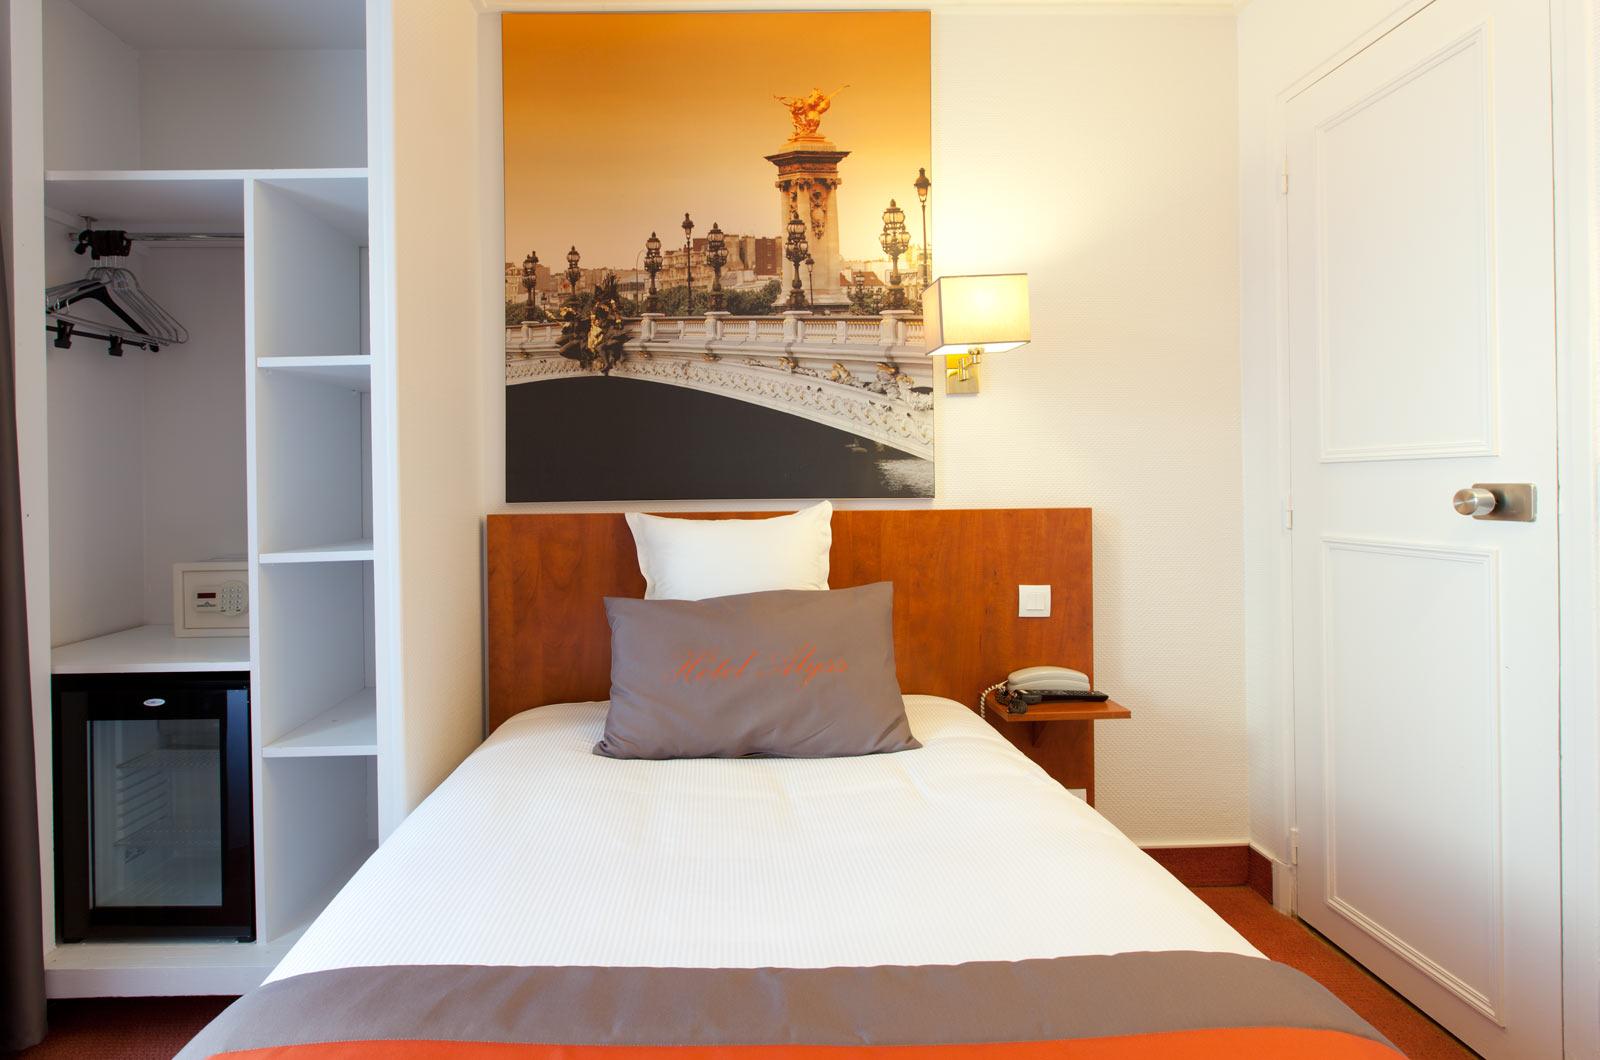 Hotel Saphir Grenelle Hotel Alyss Saphir Cambronne Eiffel Paris Official Website